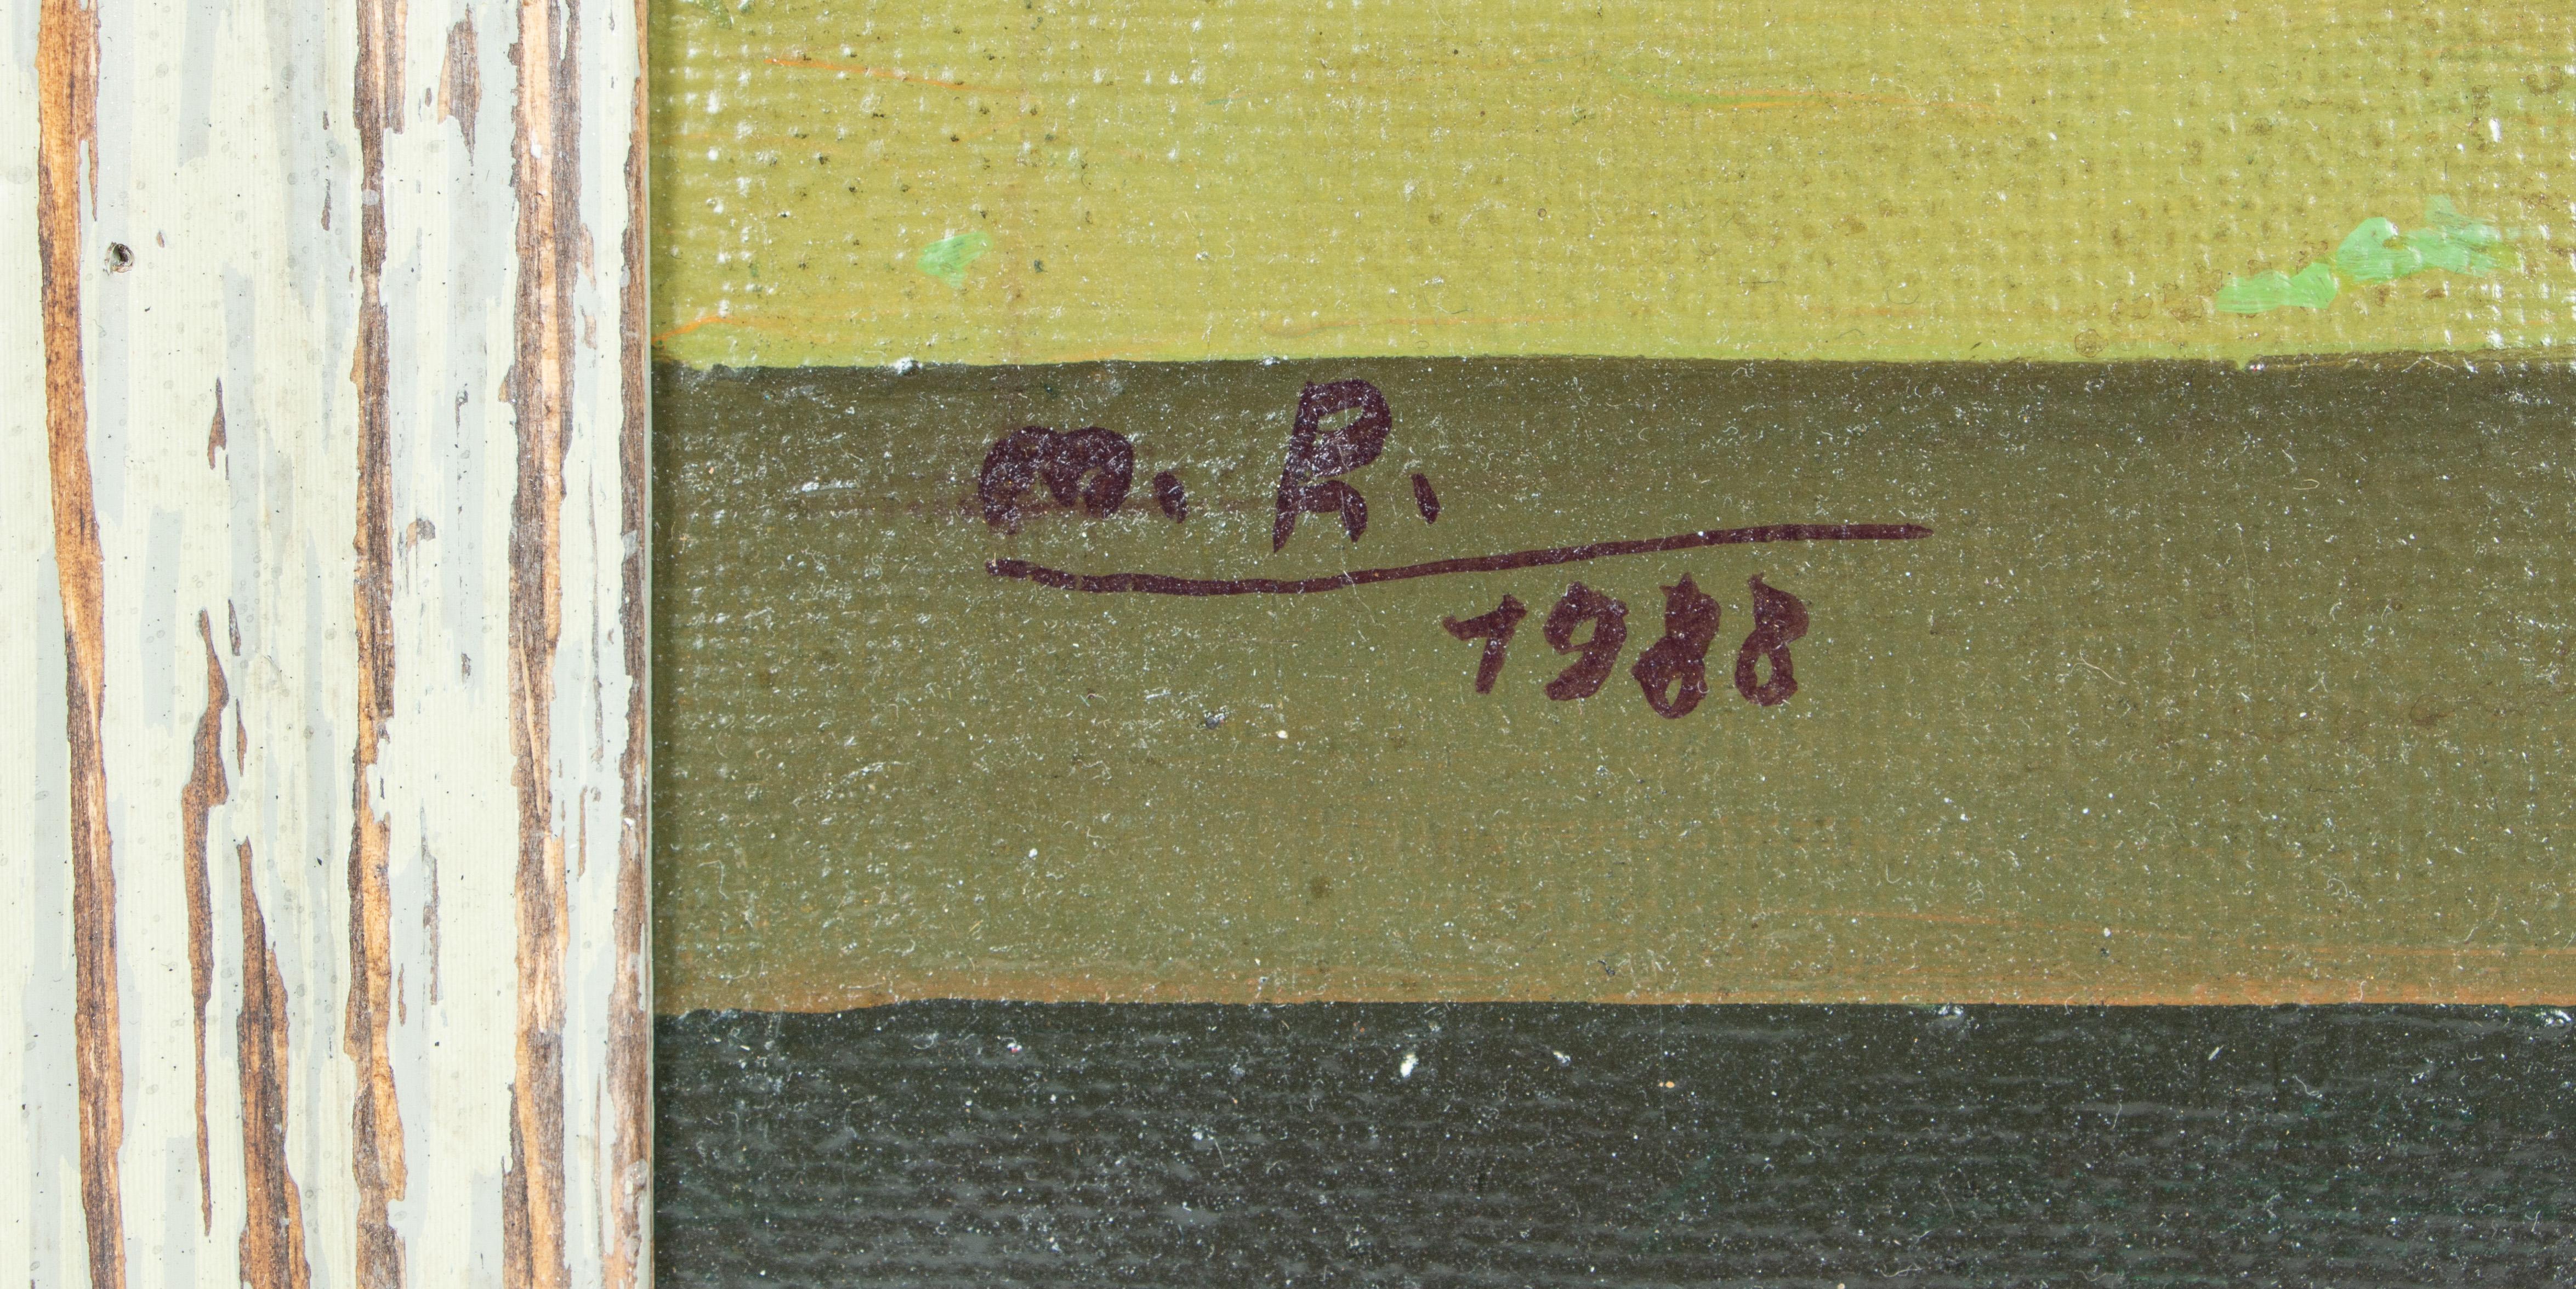 OTAR CHKHARTISHVILI (GEORGIAN 1938-2006) - Image 3 of 5